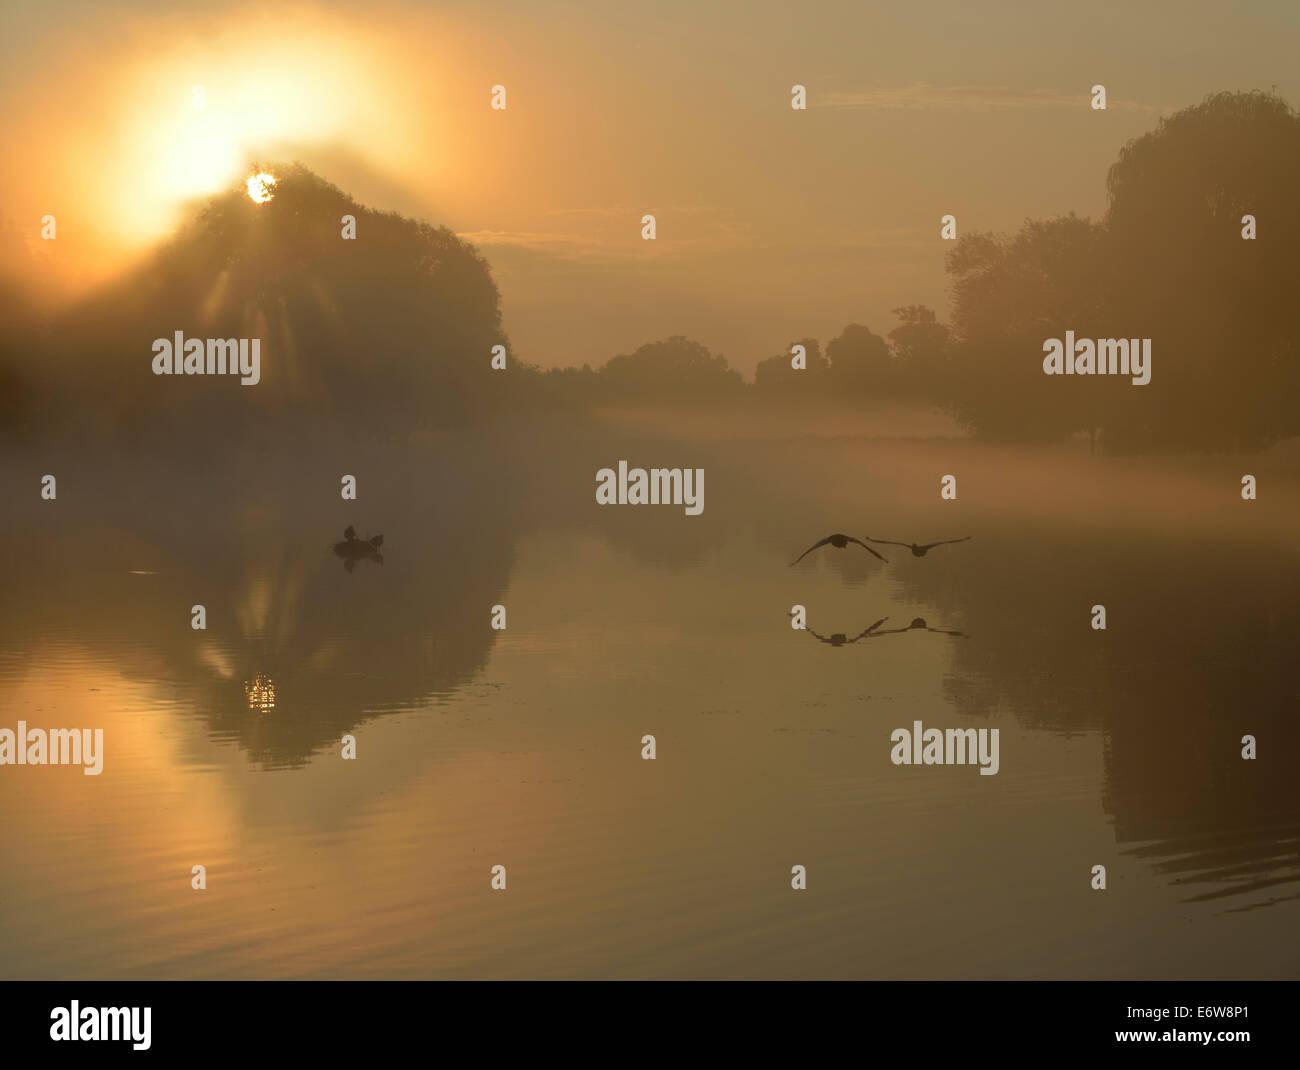 Misty sunrise over Leg of Mutton pond, Bushy Park, London, UK - Stock Image